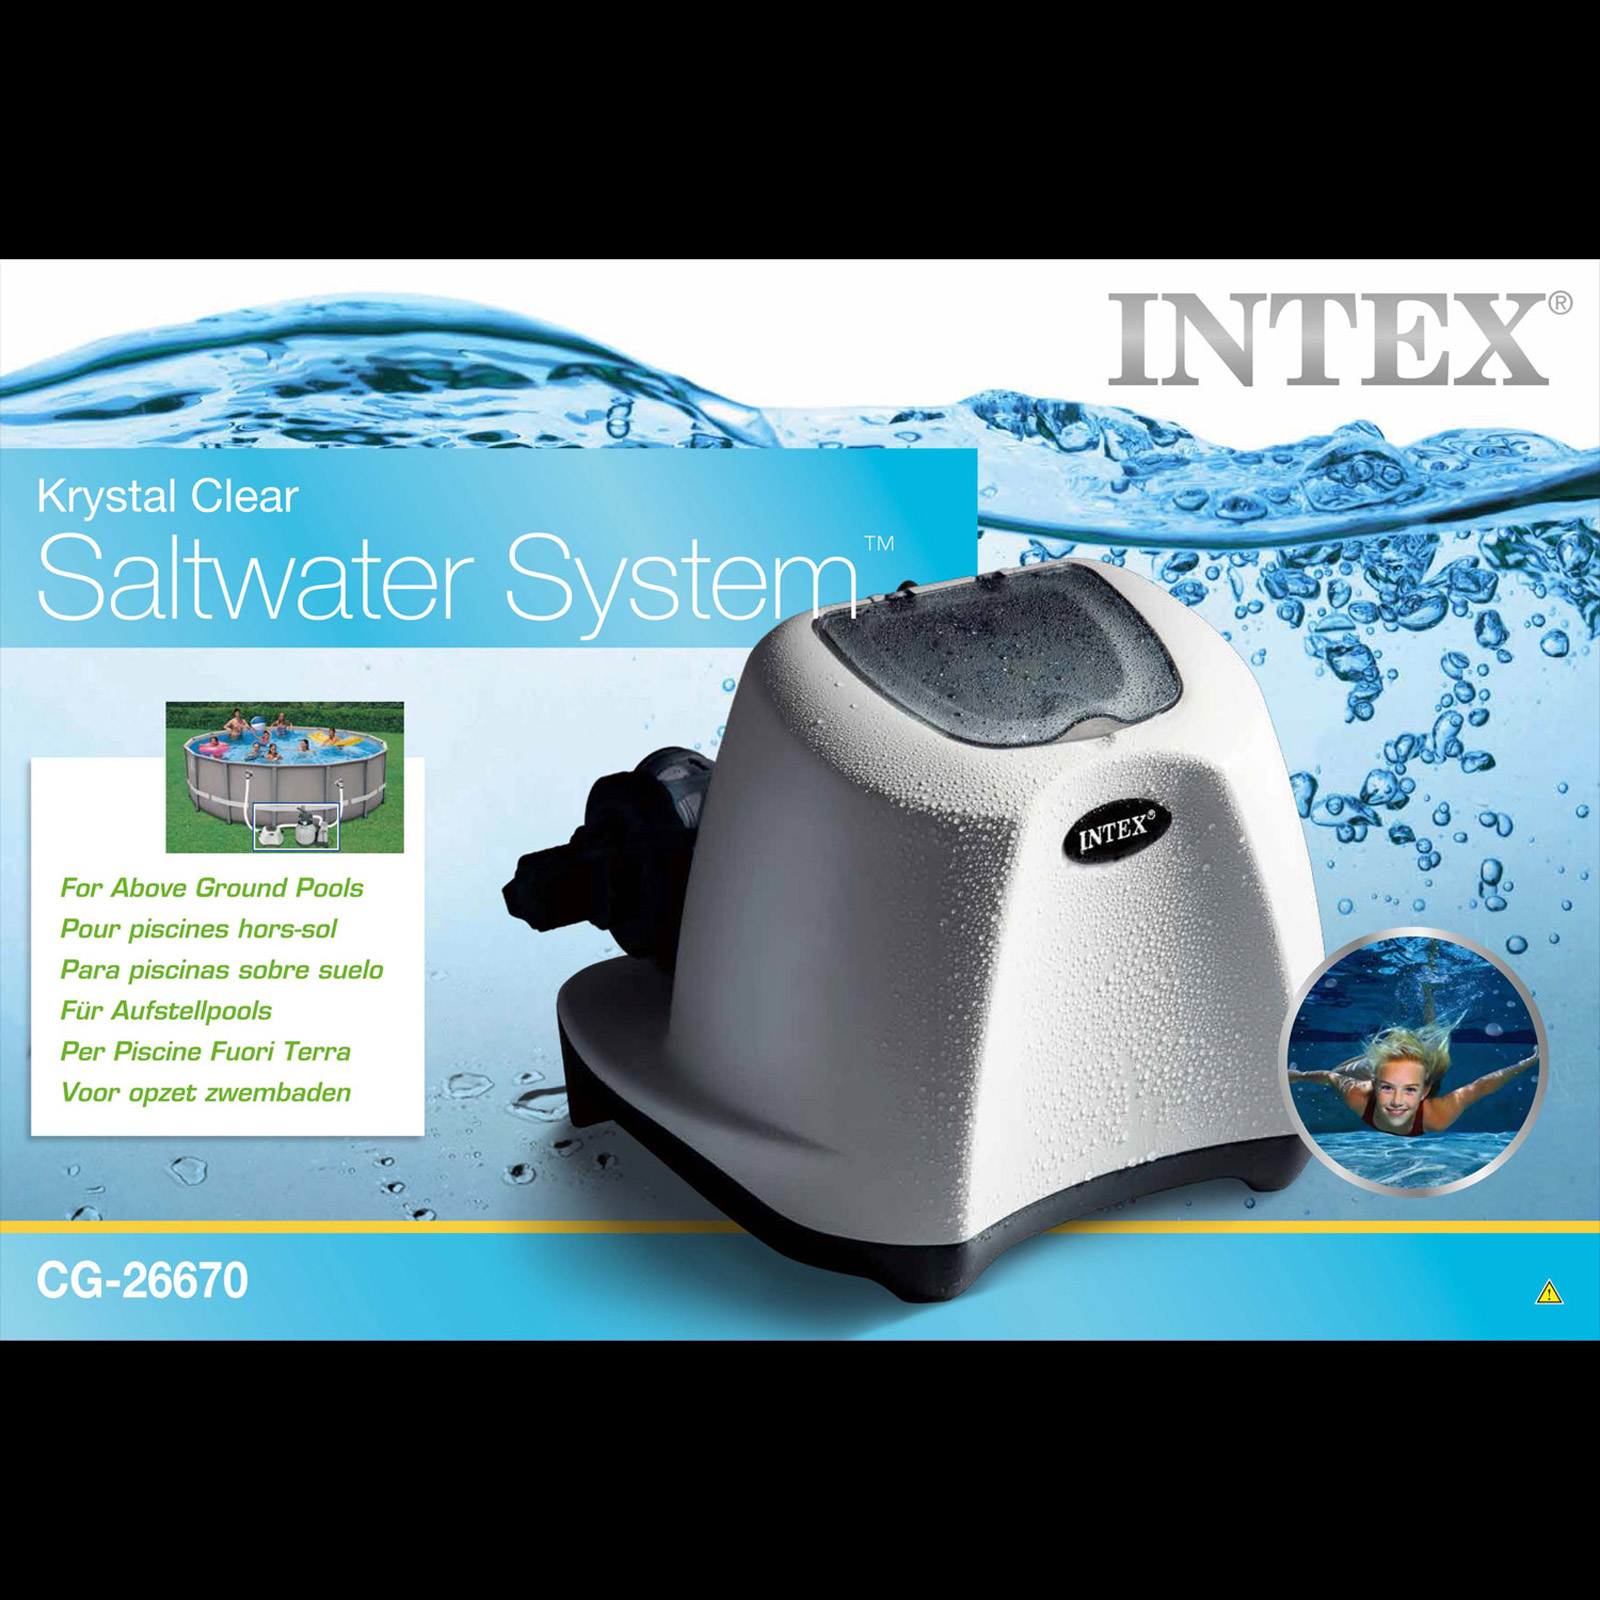 Intex Krystal Clear Salzwassersystem bis 56.800 Liter Chlorinator